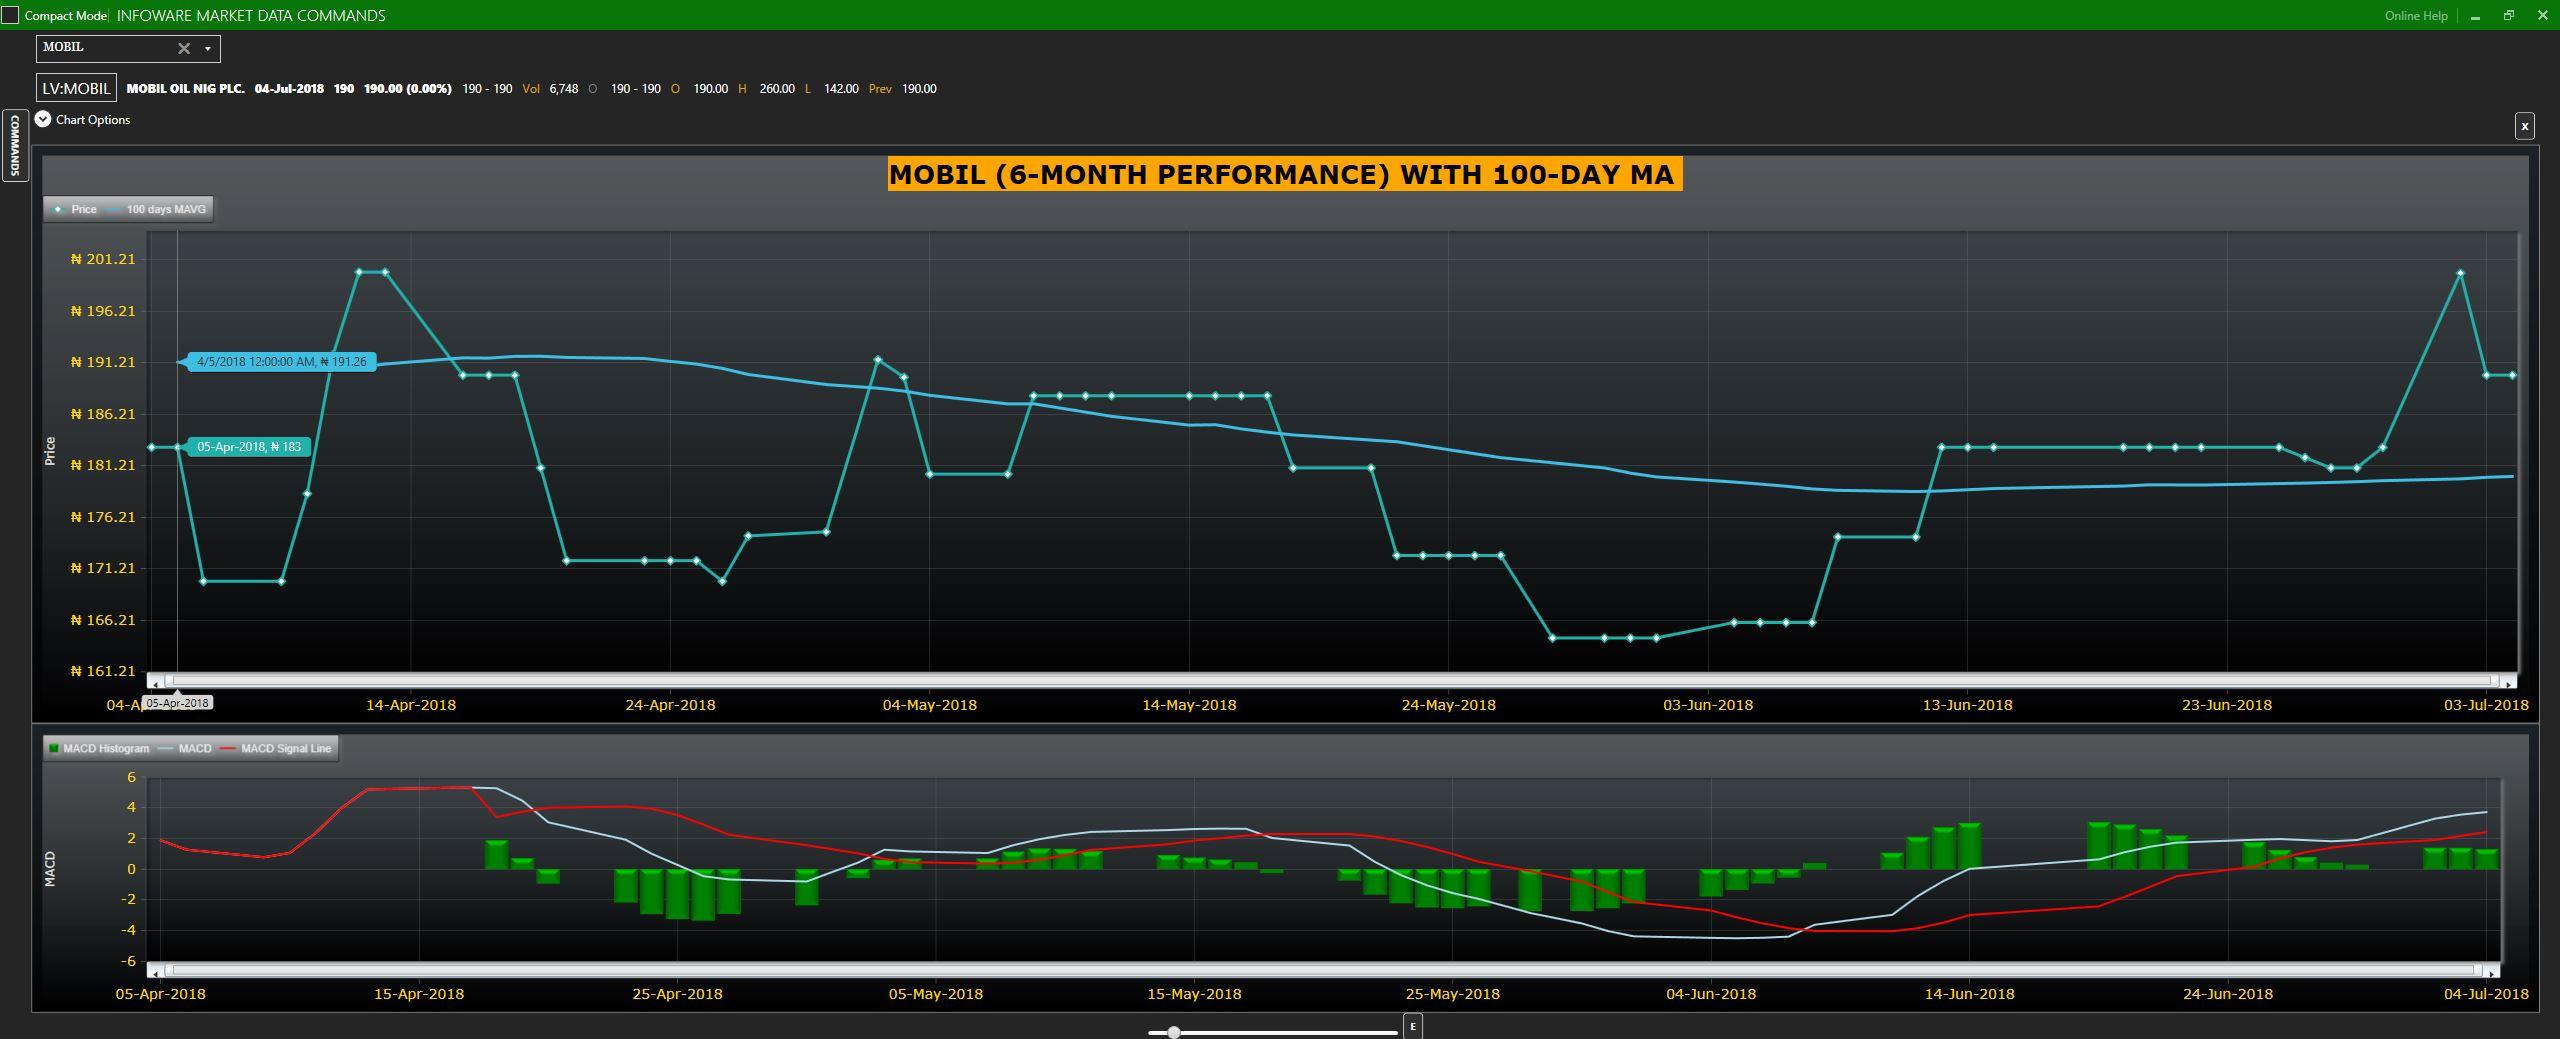 MOBIL (11) stock graph